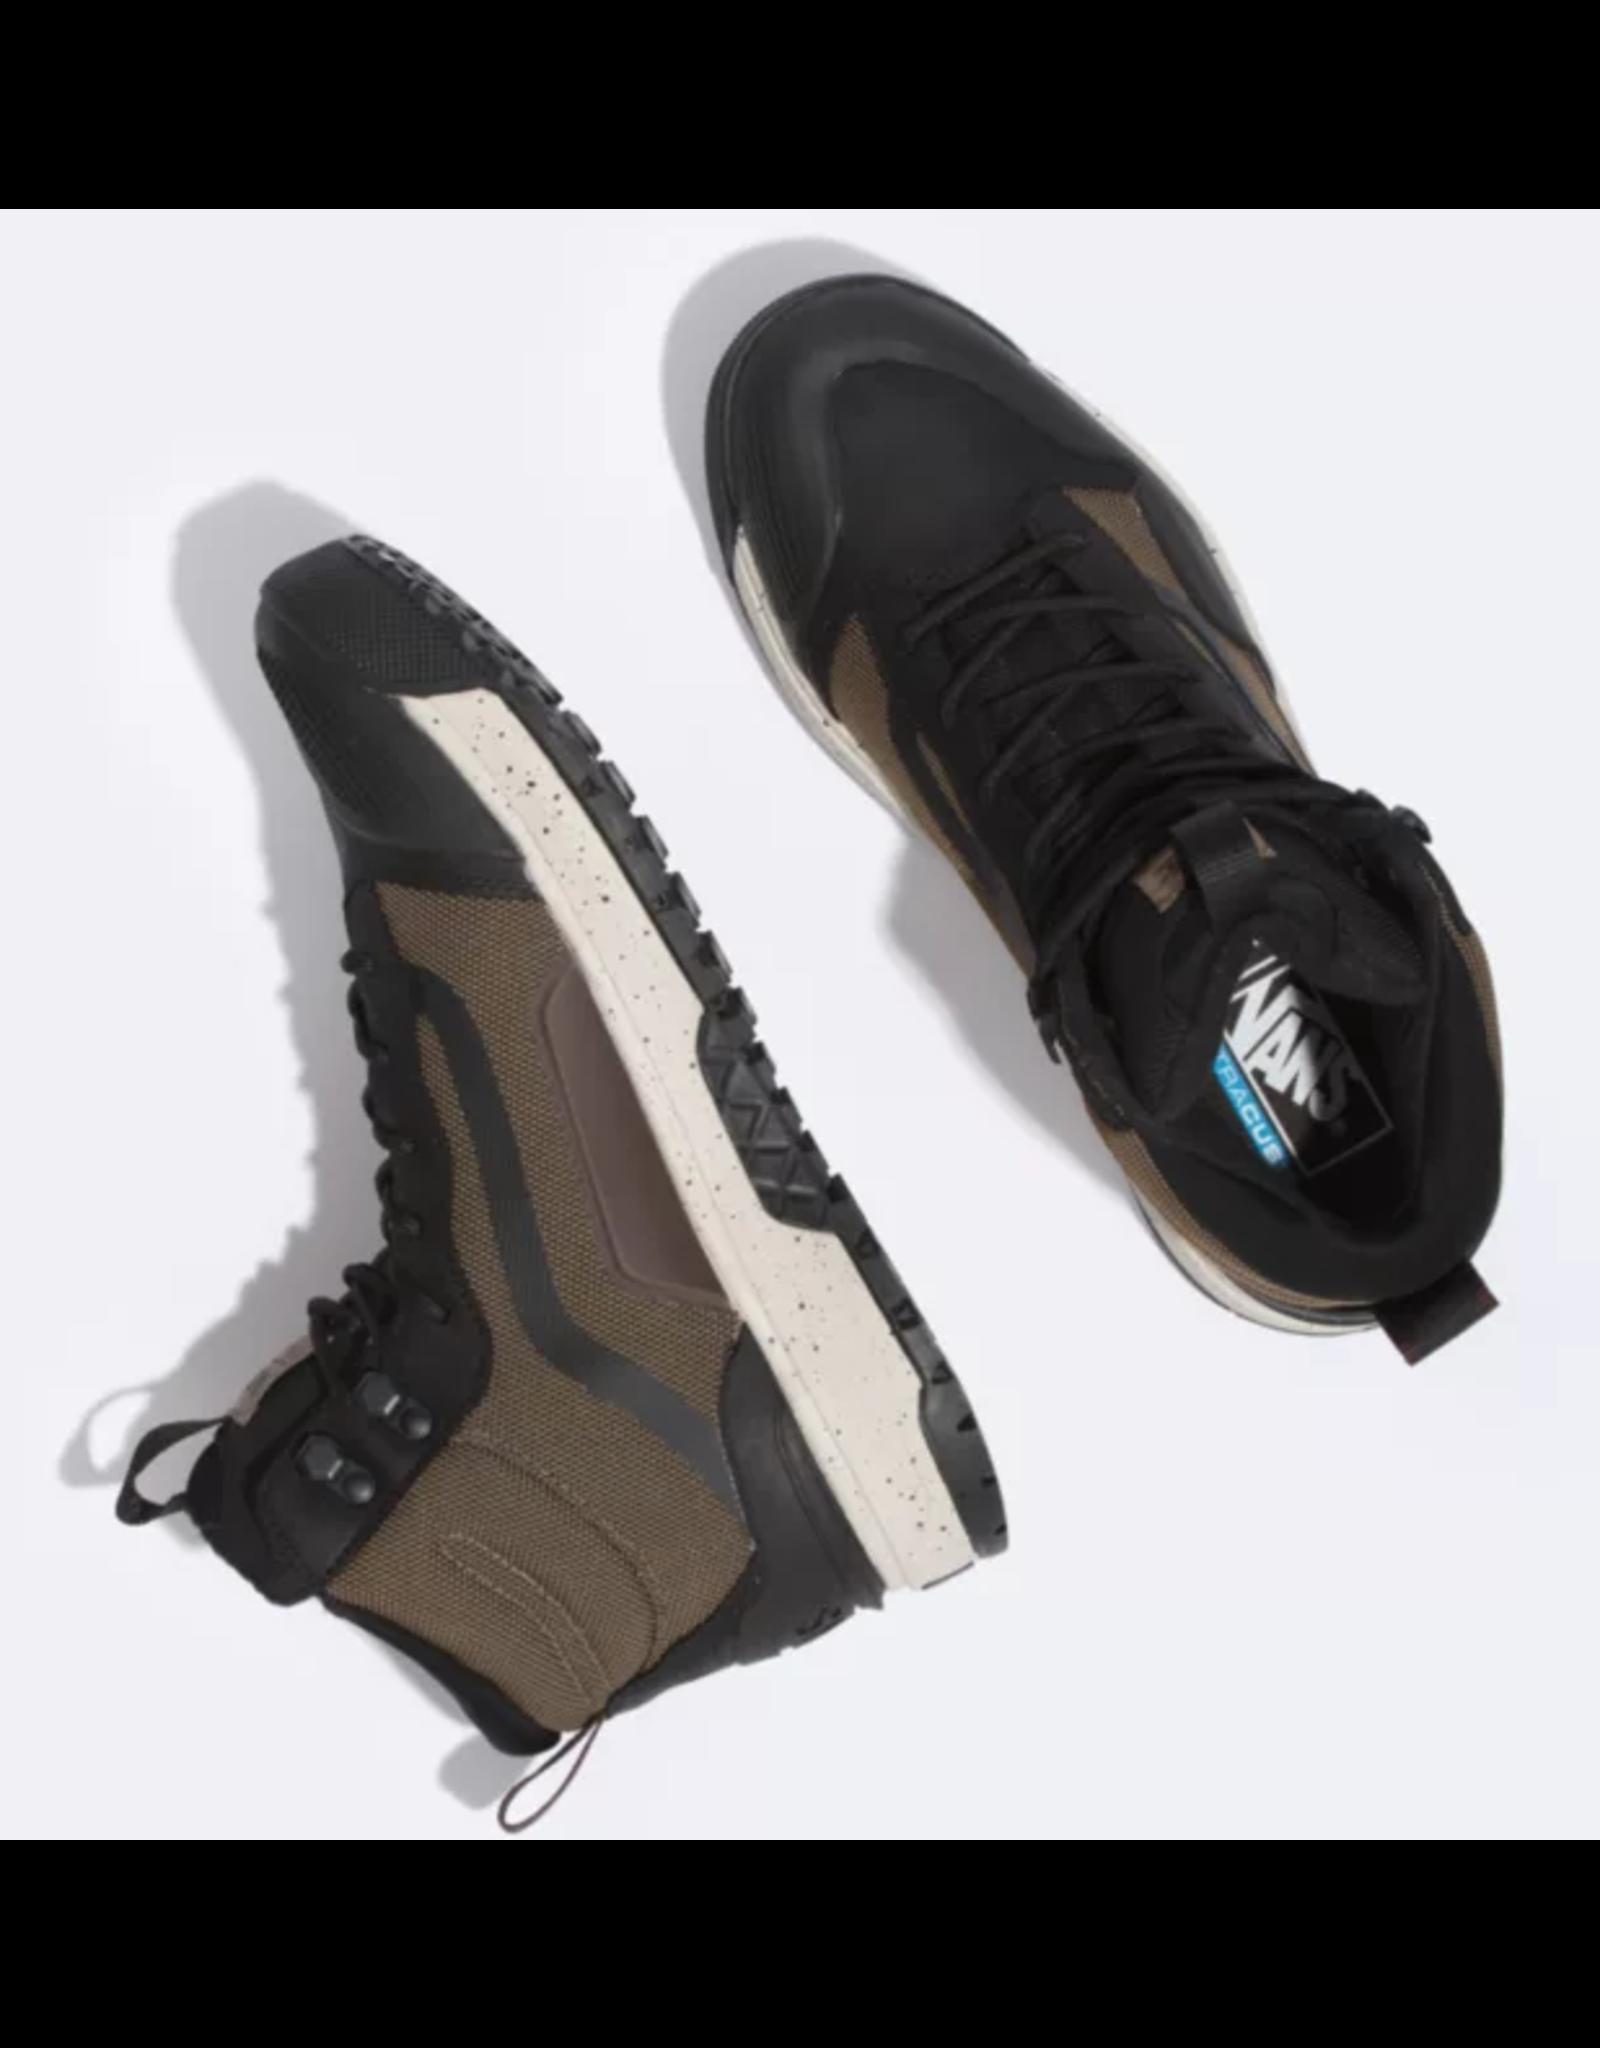 Vans Ultrarange Exo Hi MTE Gore-Tex DW Snow Boots - Brown/Black